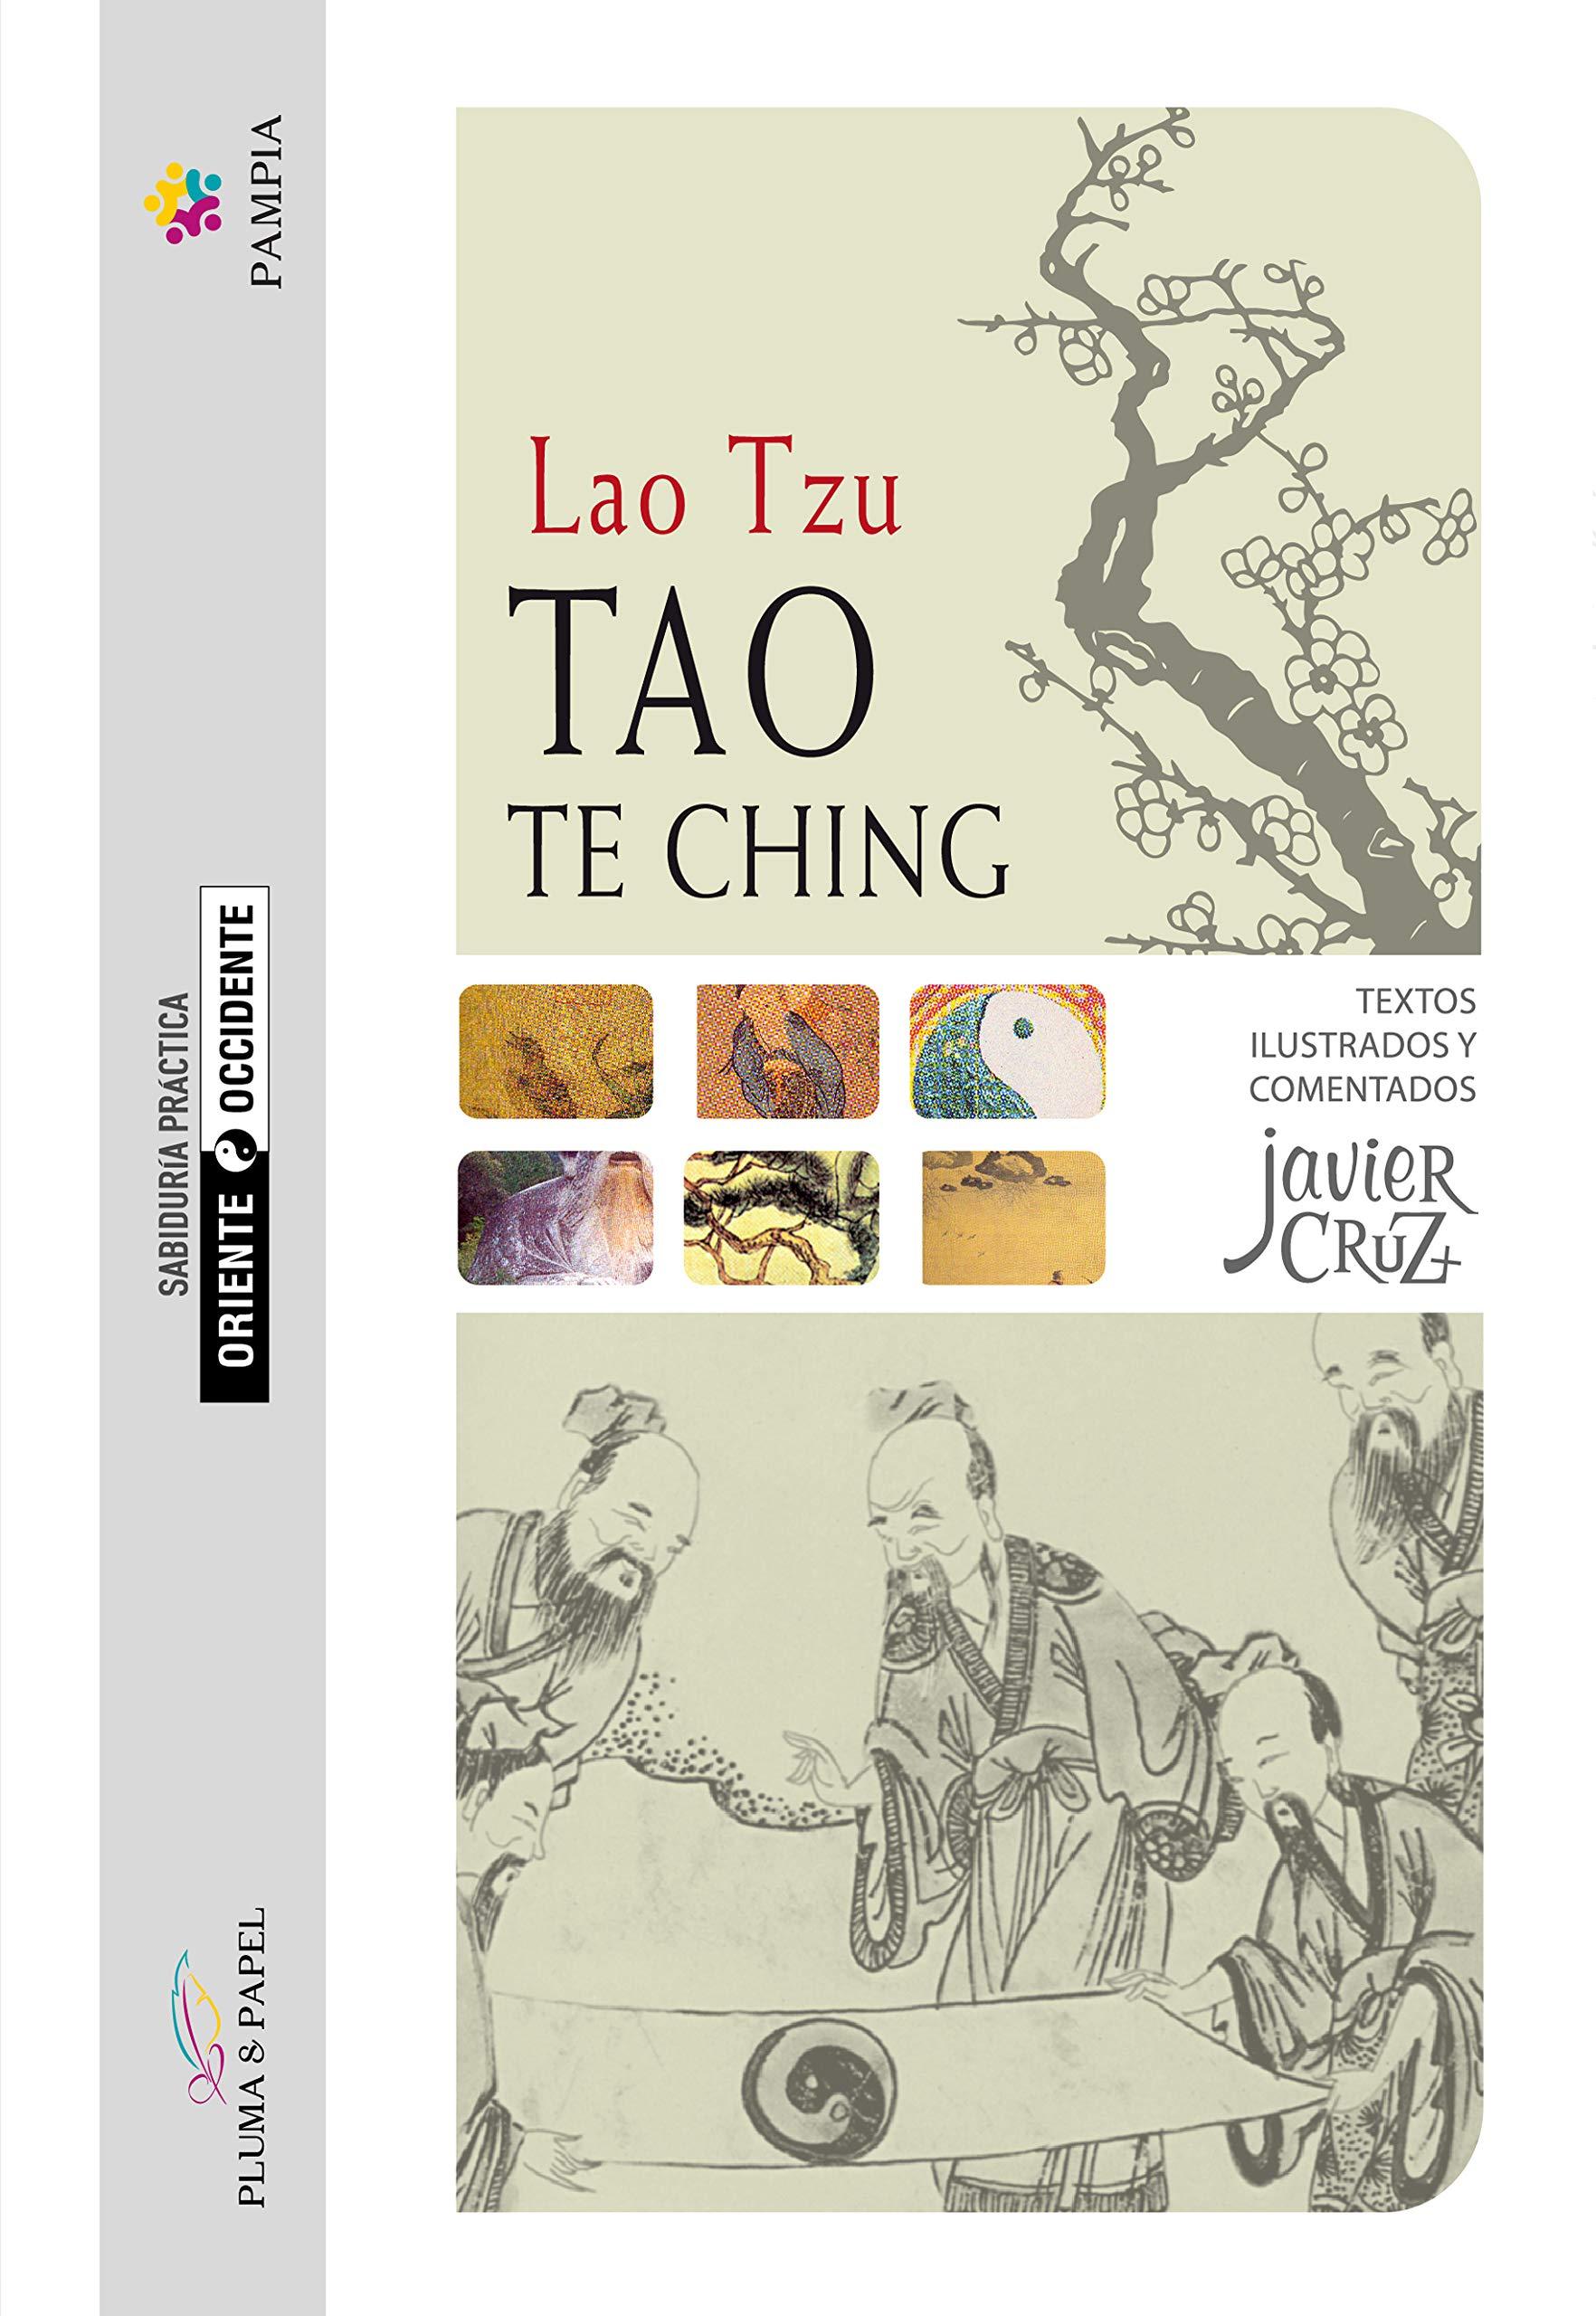 Tao Te Ching - anotado, comentado e ilustrado: Lao Tzu Tao Te Ching